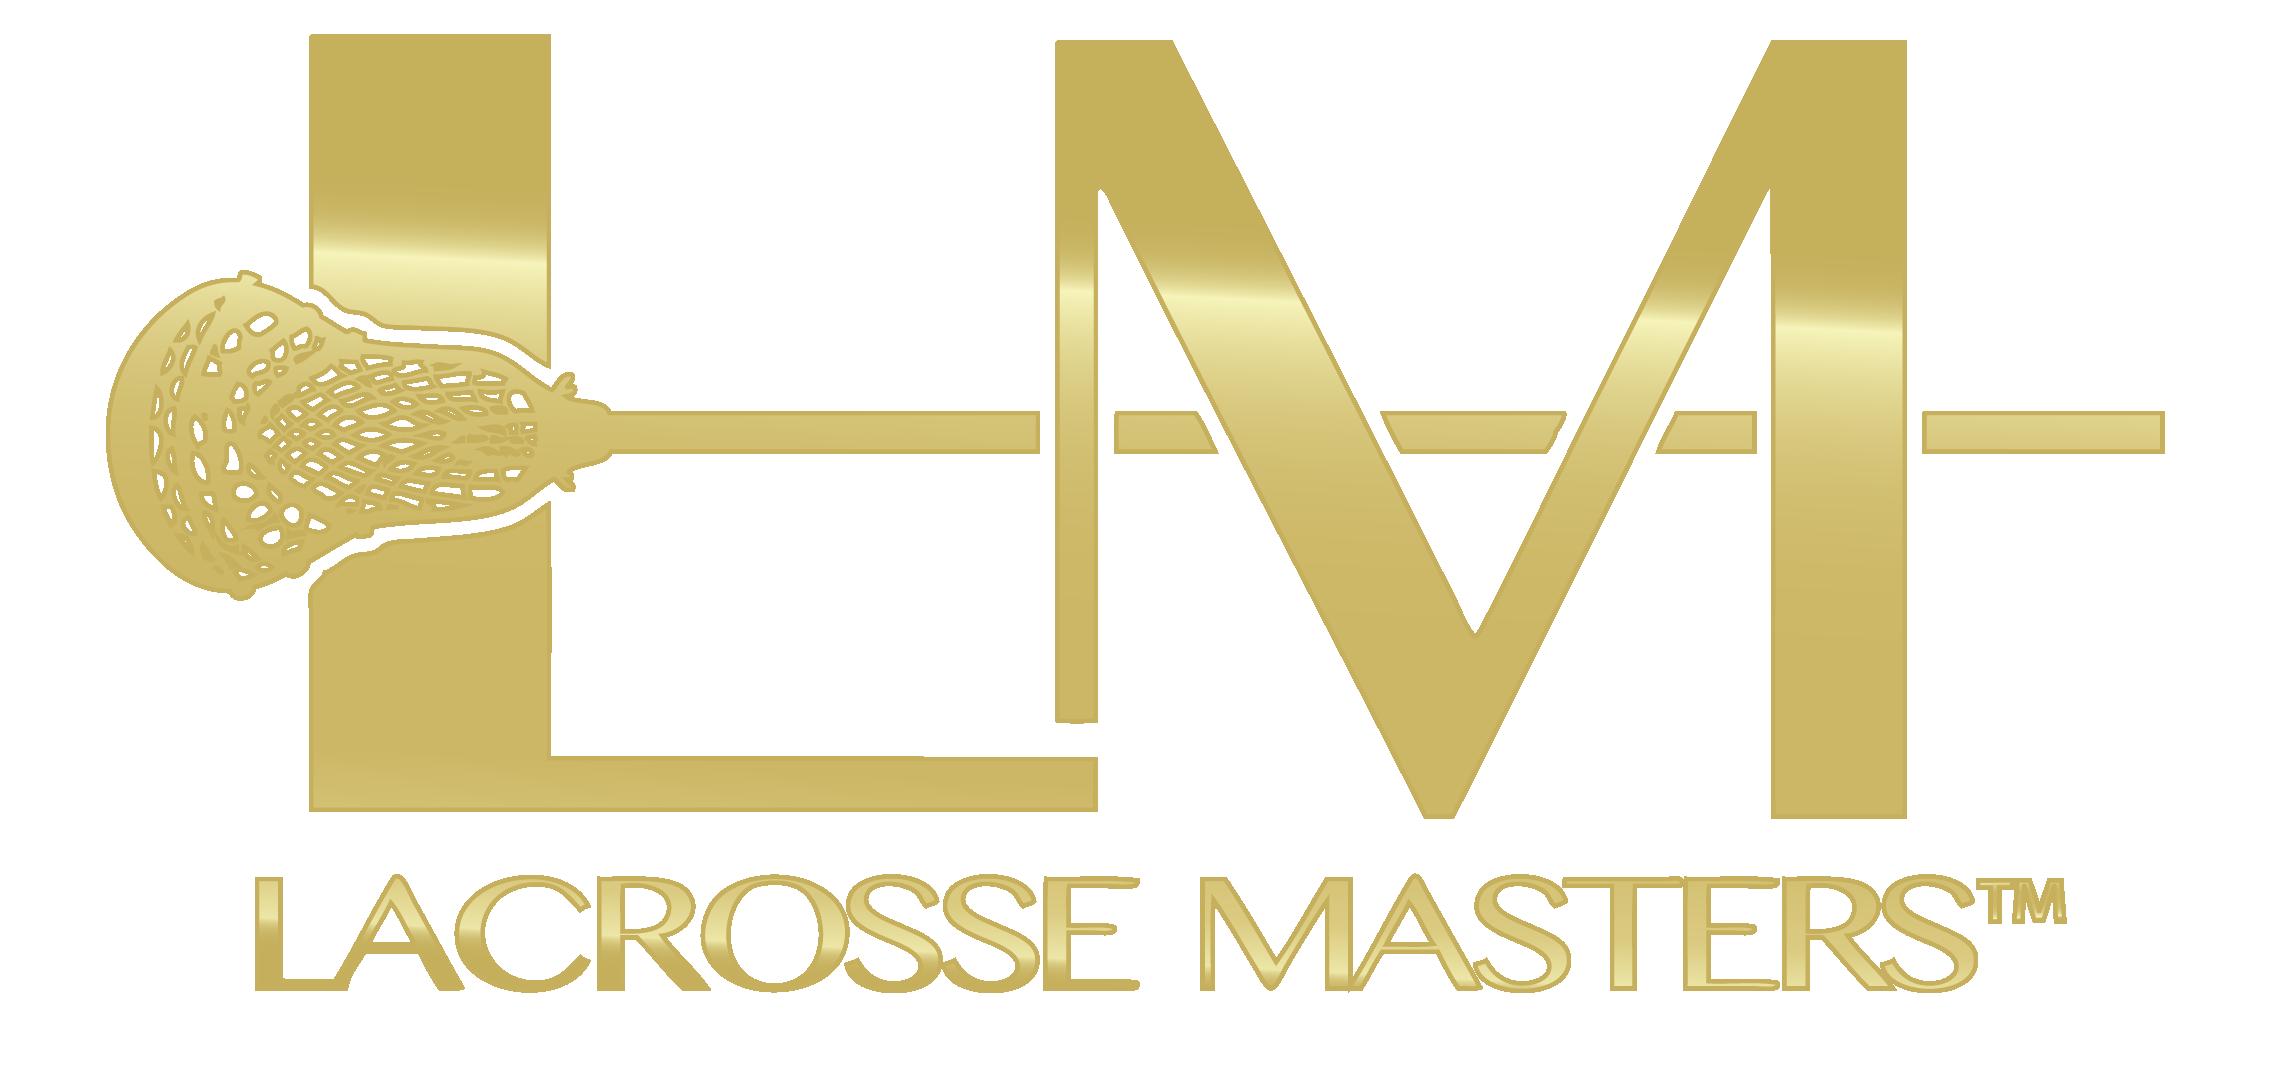 Lacrosse Masters